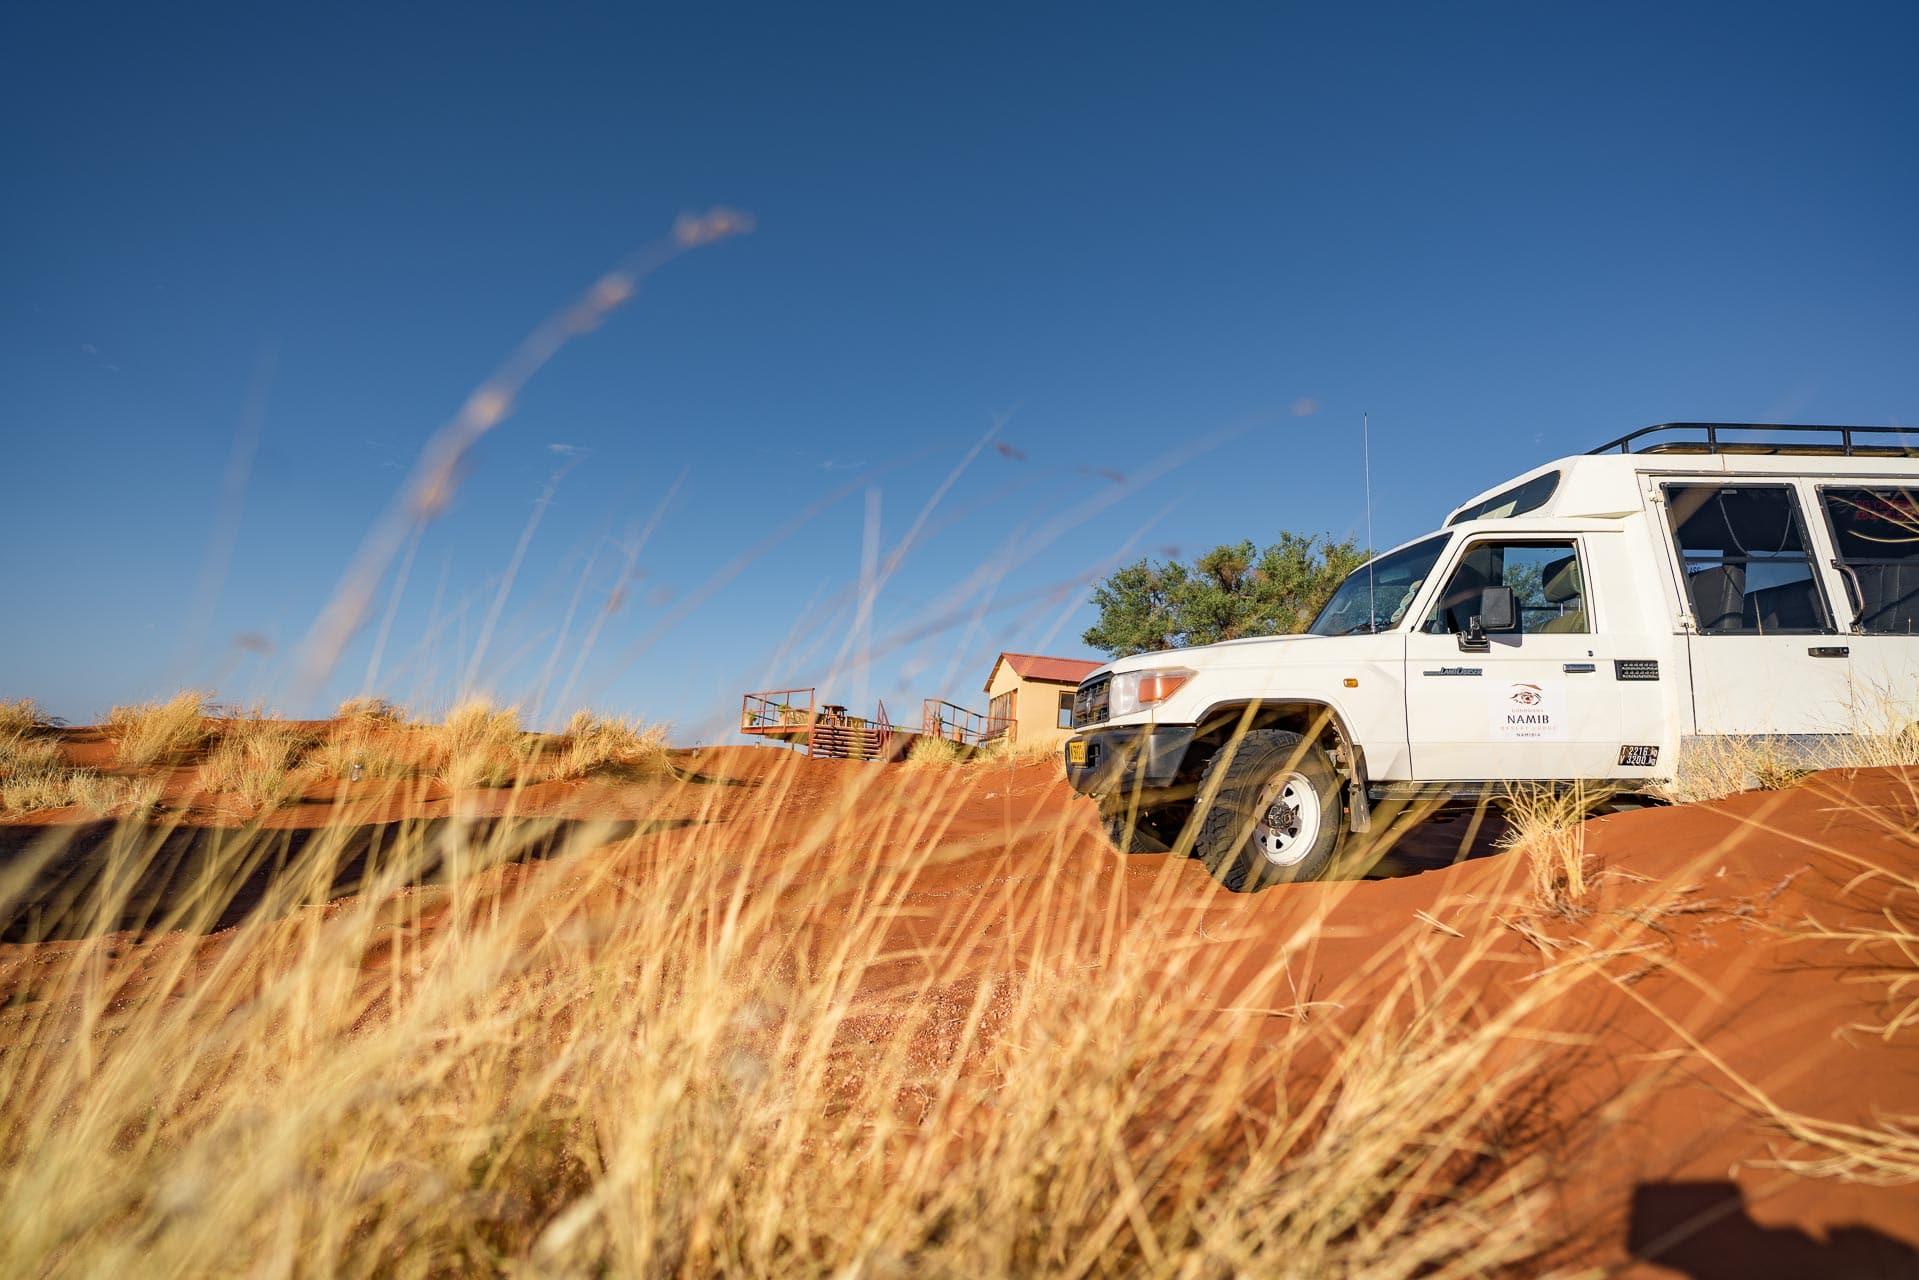 Namib-Dune-Star-Camp-24